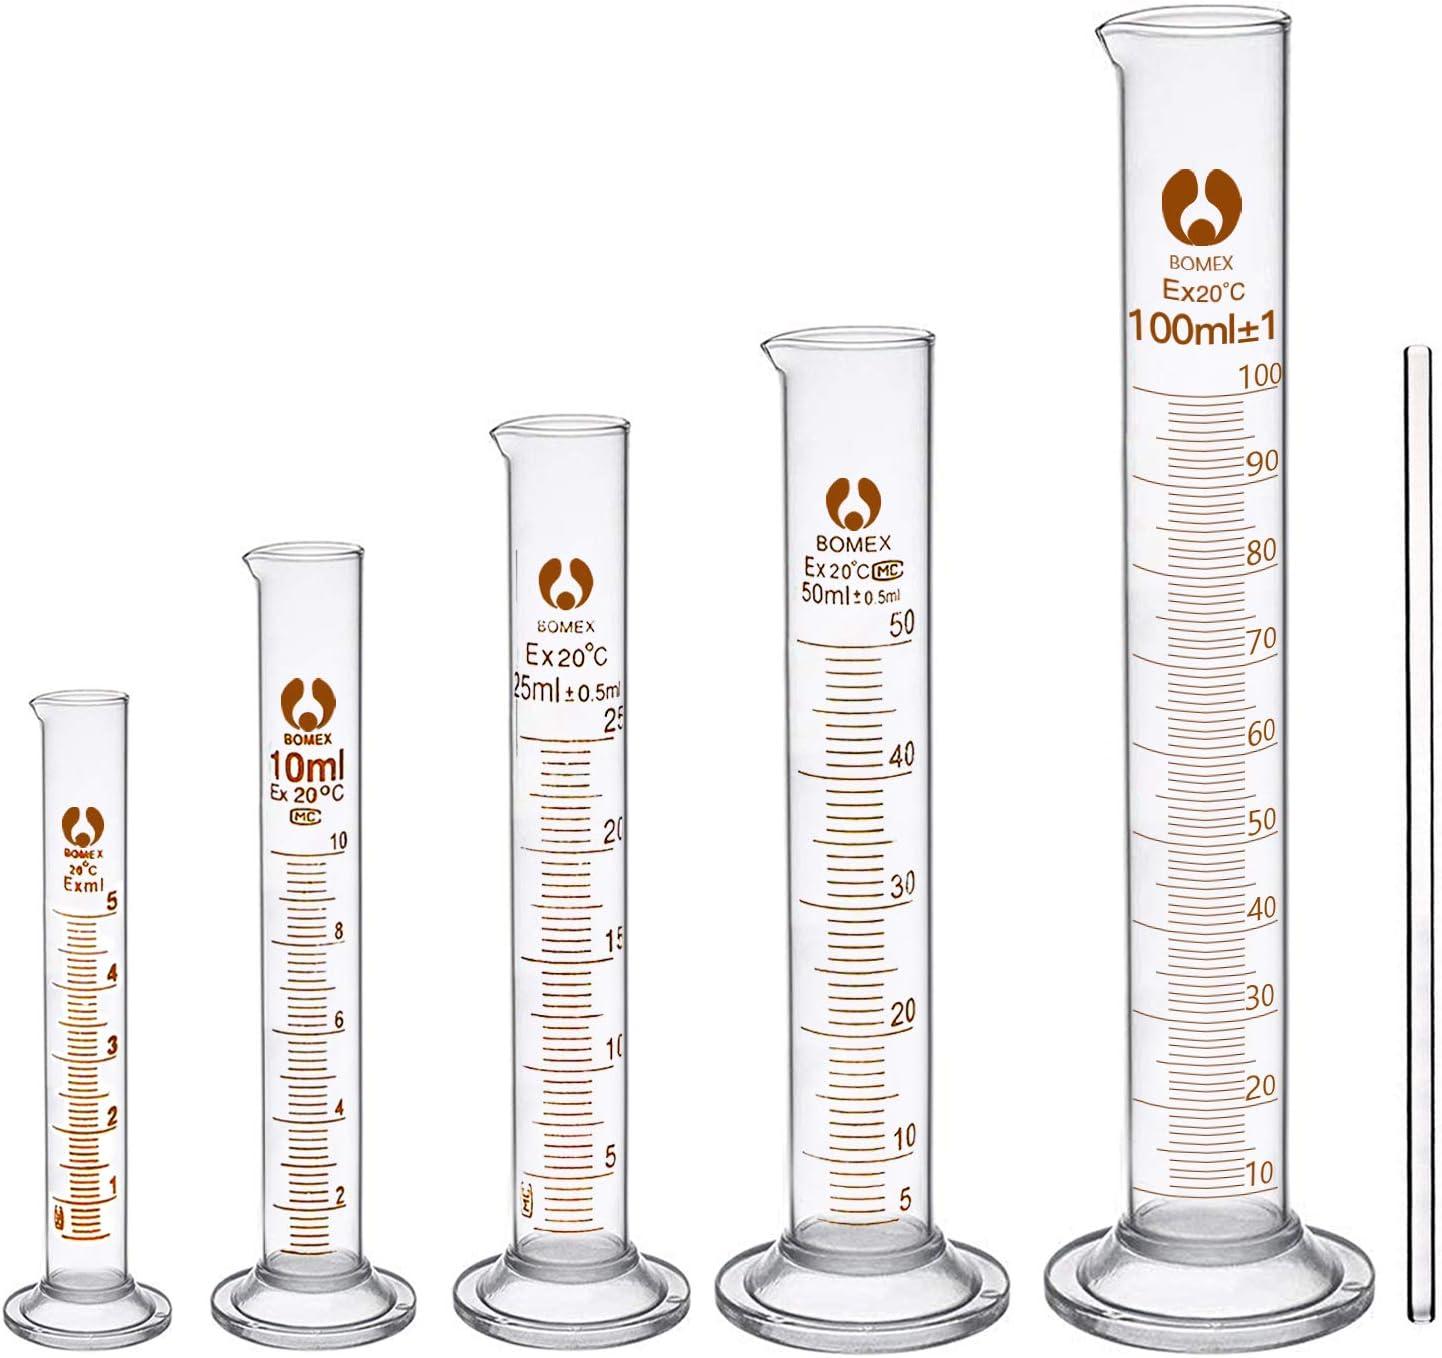 cococity Cilindro de Medición Laboratorio, 5pcs Cilindro Graduado de Medición, Vaso Cilindro Graduado Vídrio con 1 Barra para Escuela Experimento Precisión (5 10 25 50 100ml)